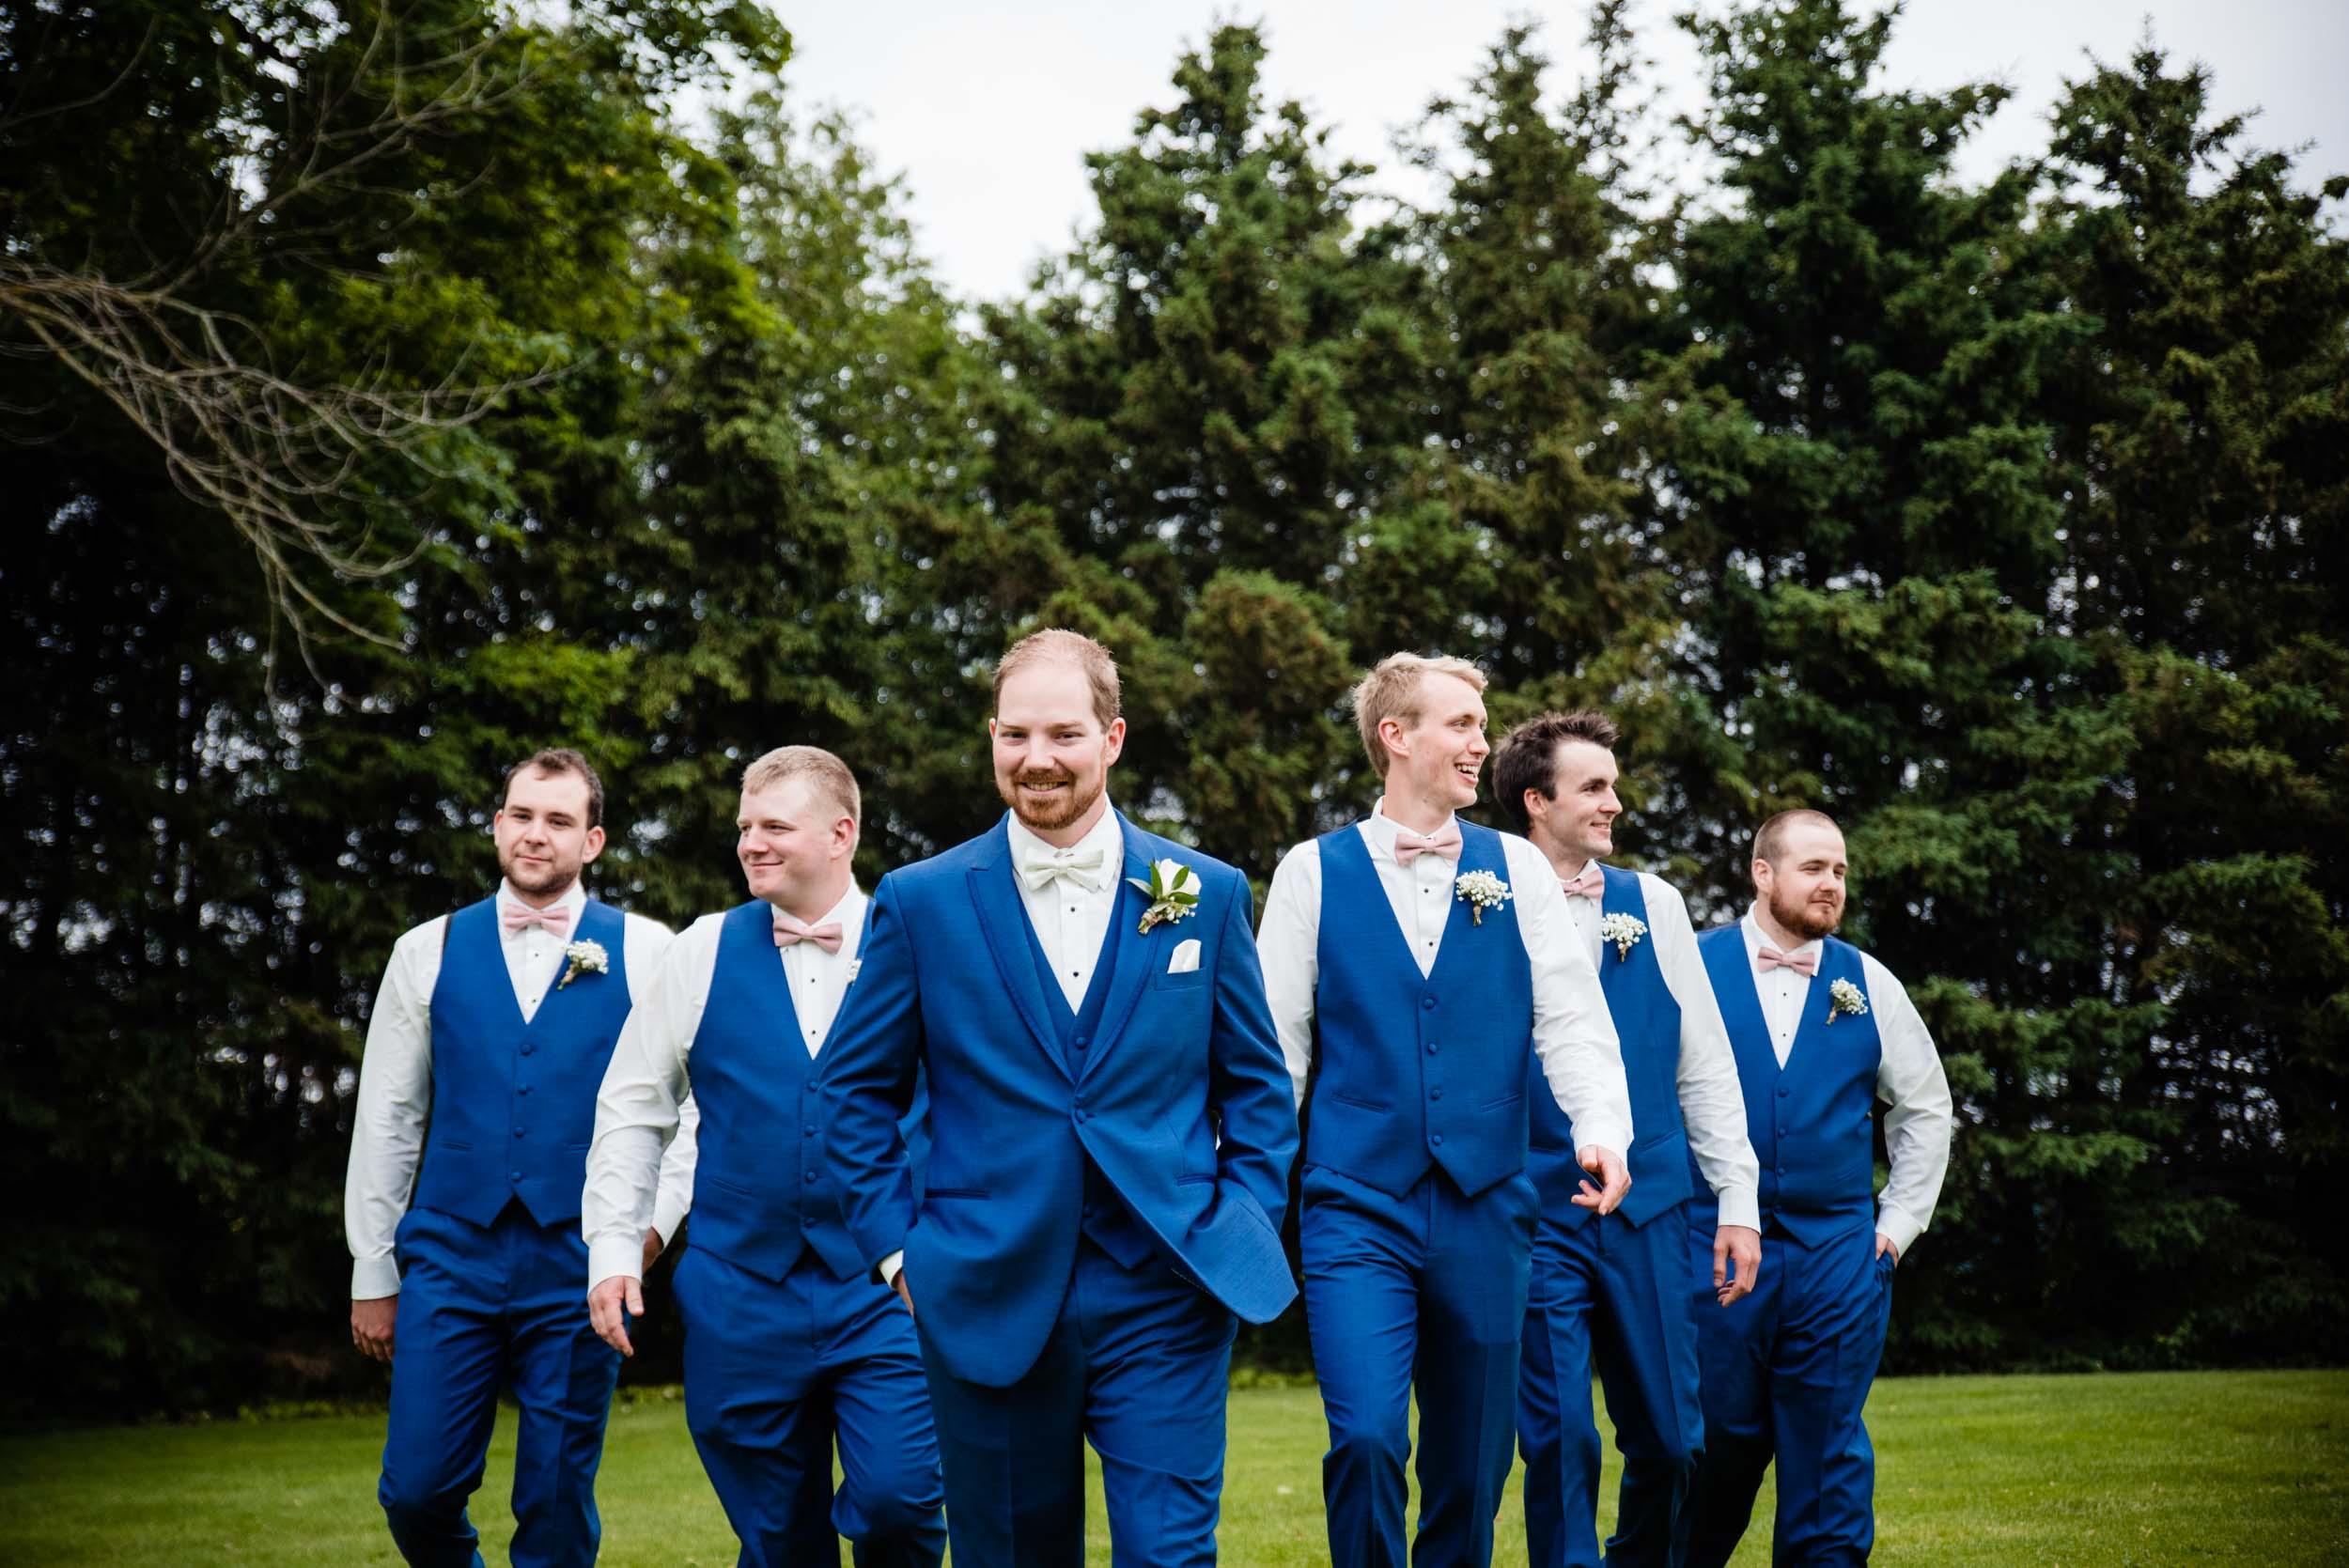 toronto-london-ontario-wedding-photographer-groomsmen.jpg